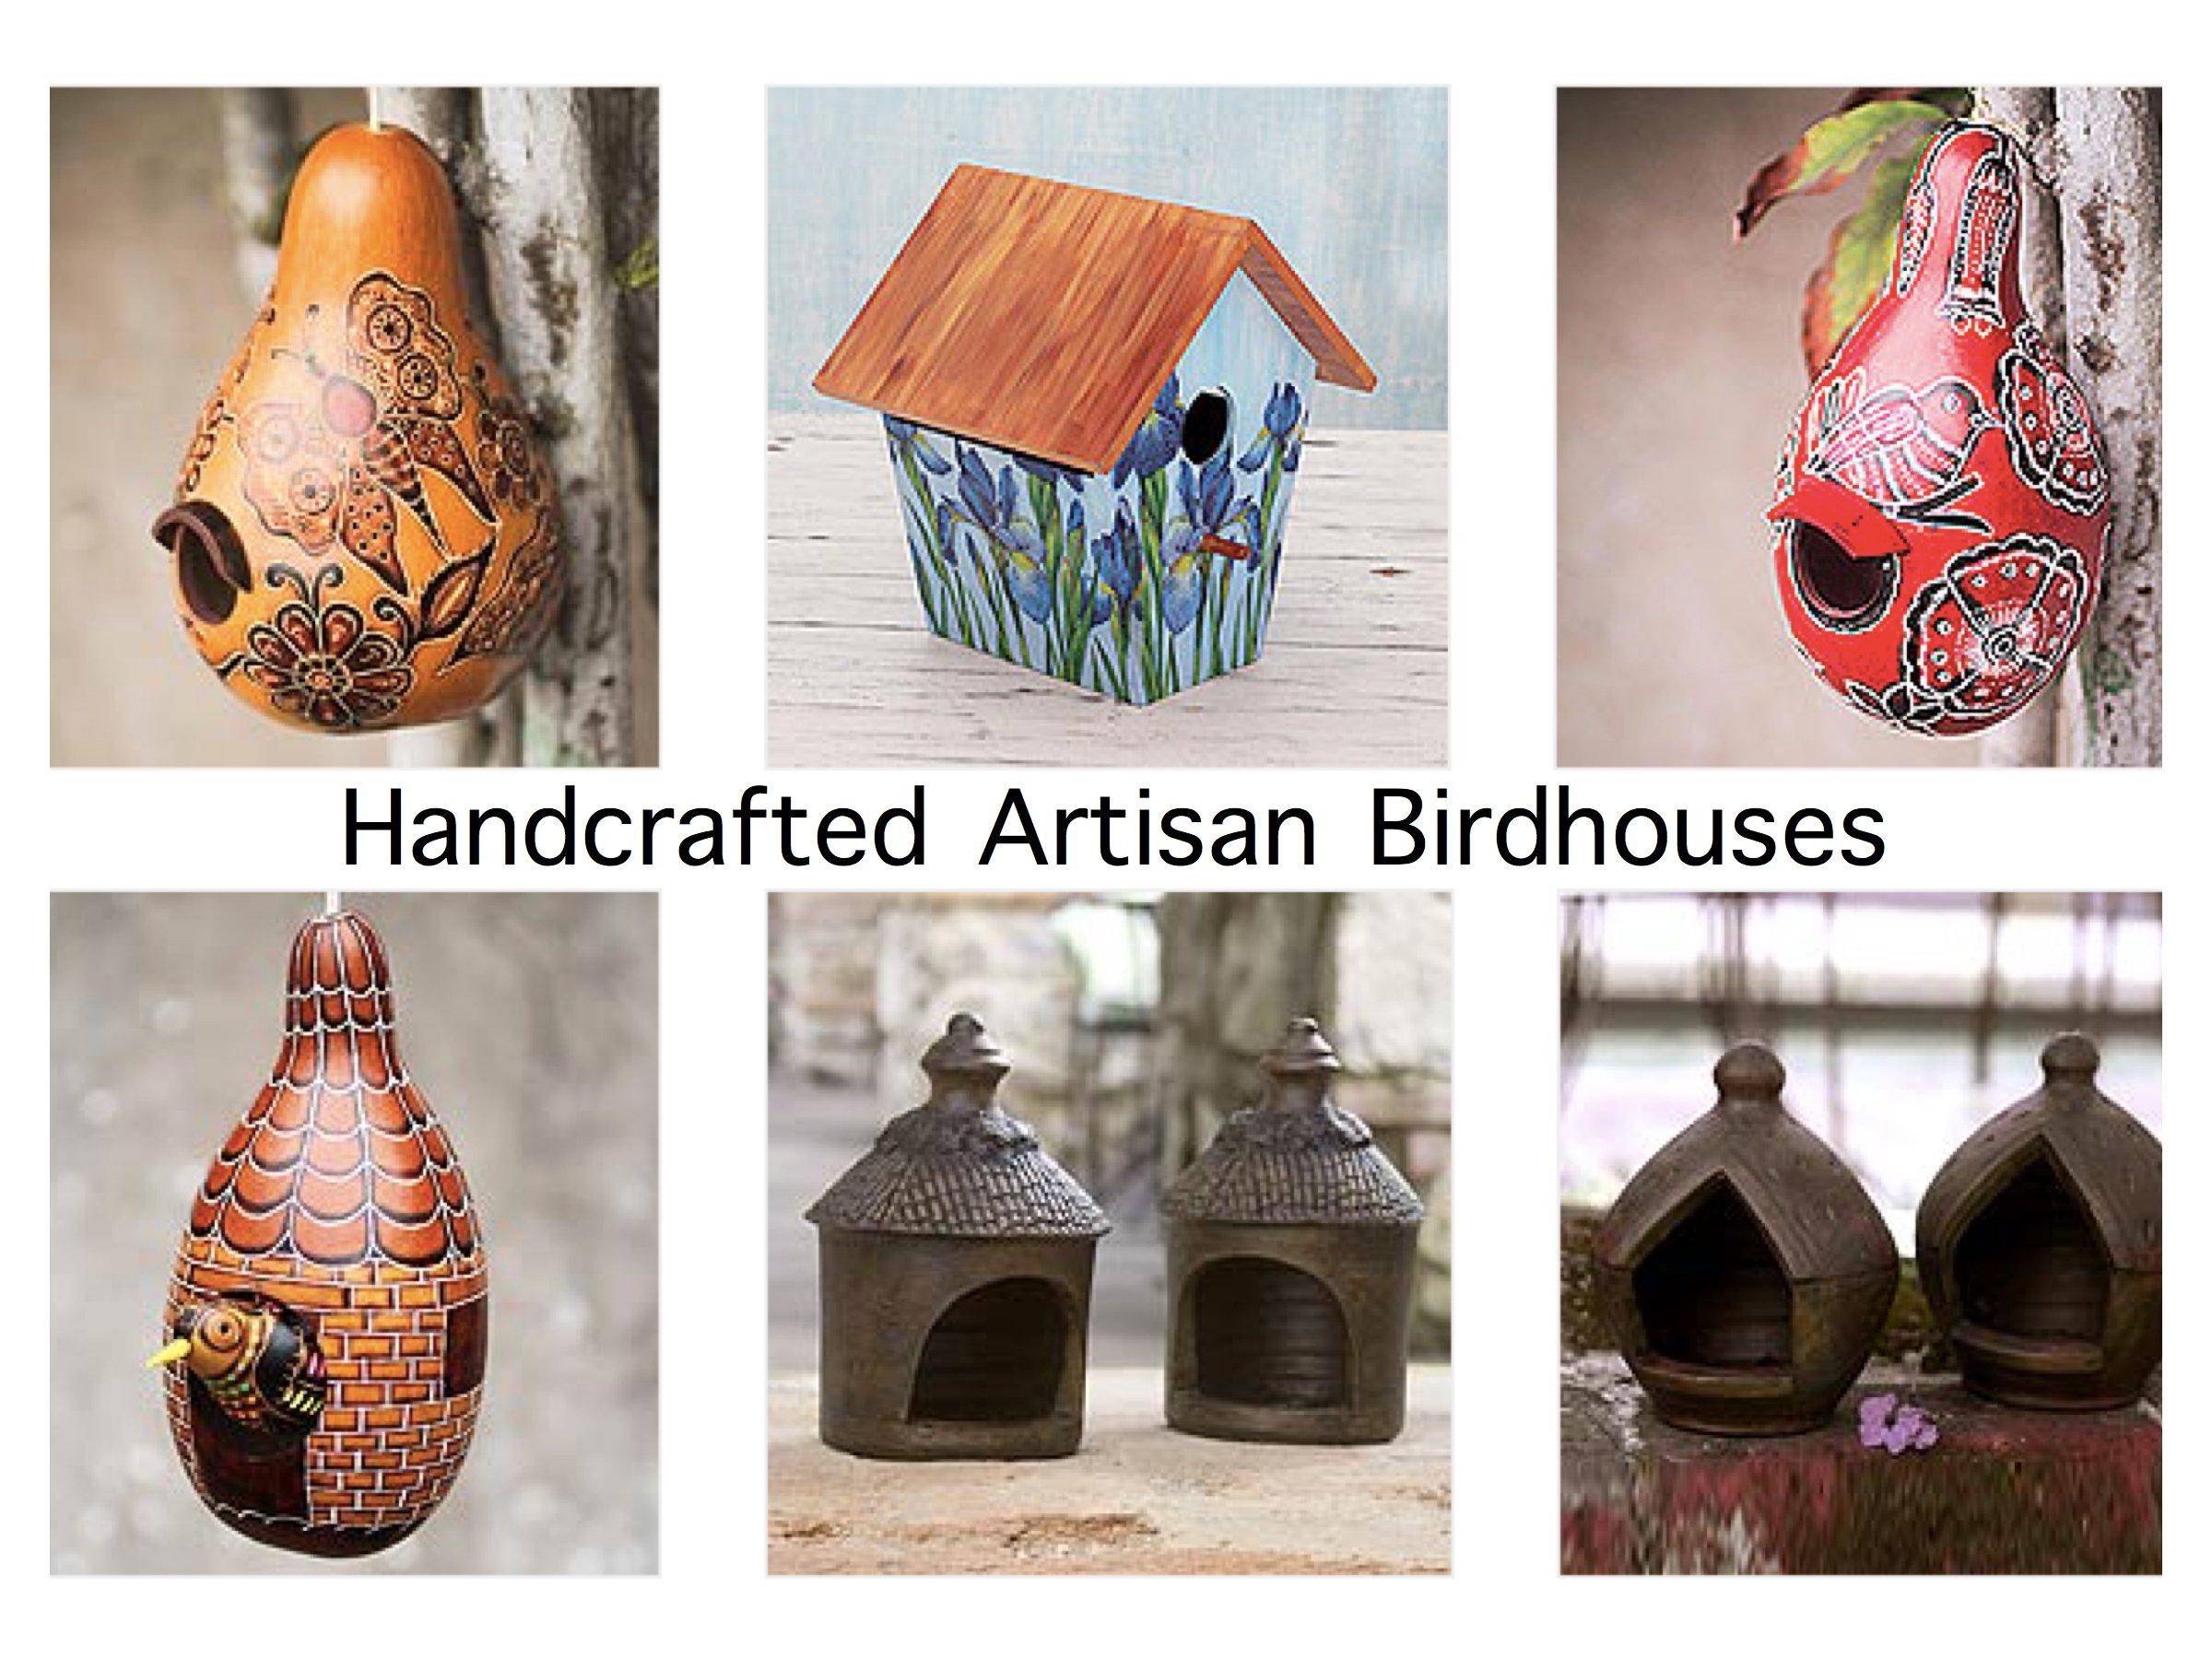 Handcrafted Artisan Birdhouses